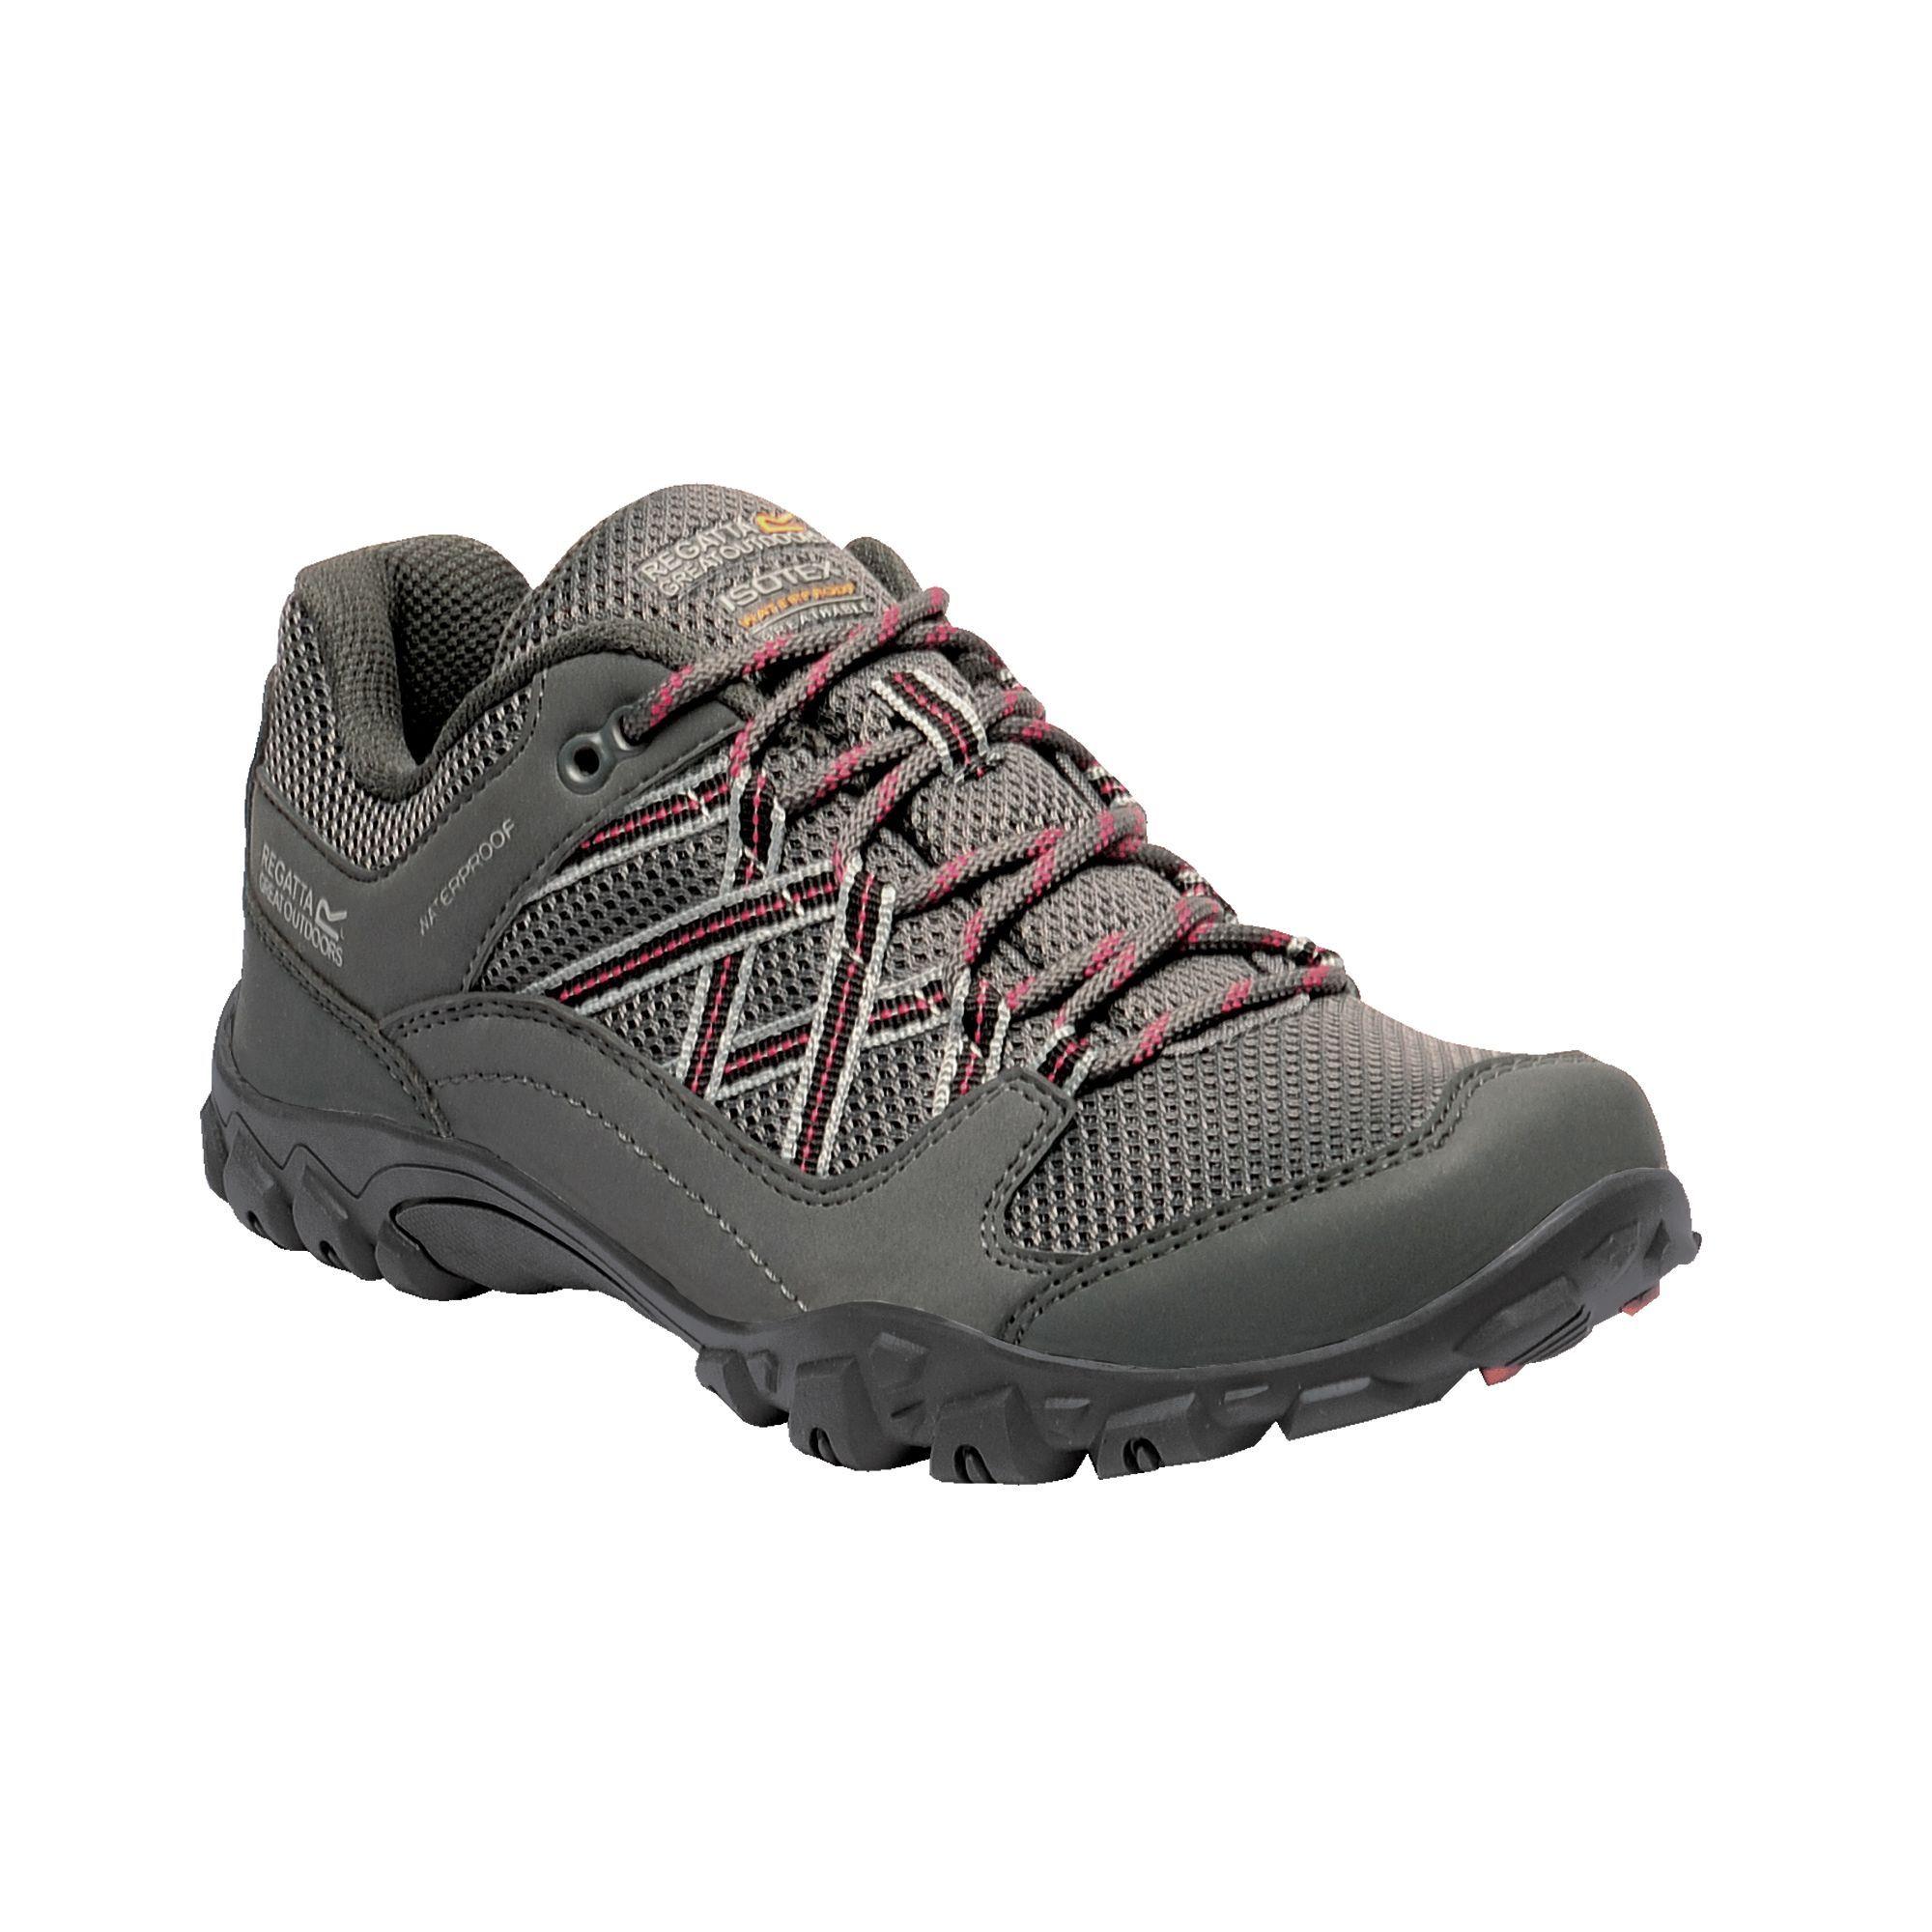 Regatta Womens/Ladies Edgepoint III Walking Shoes